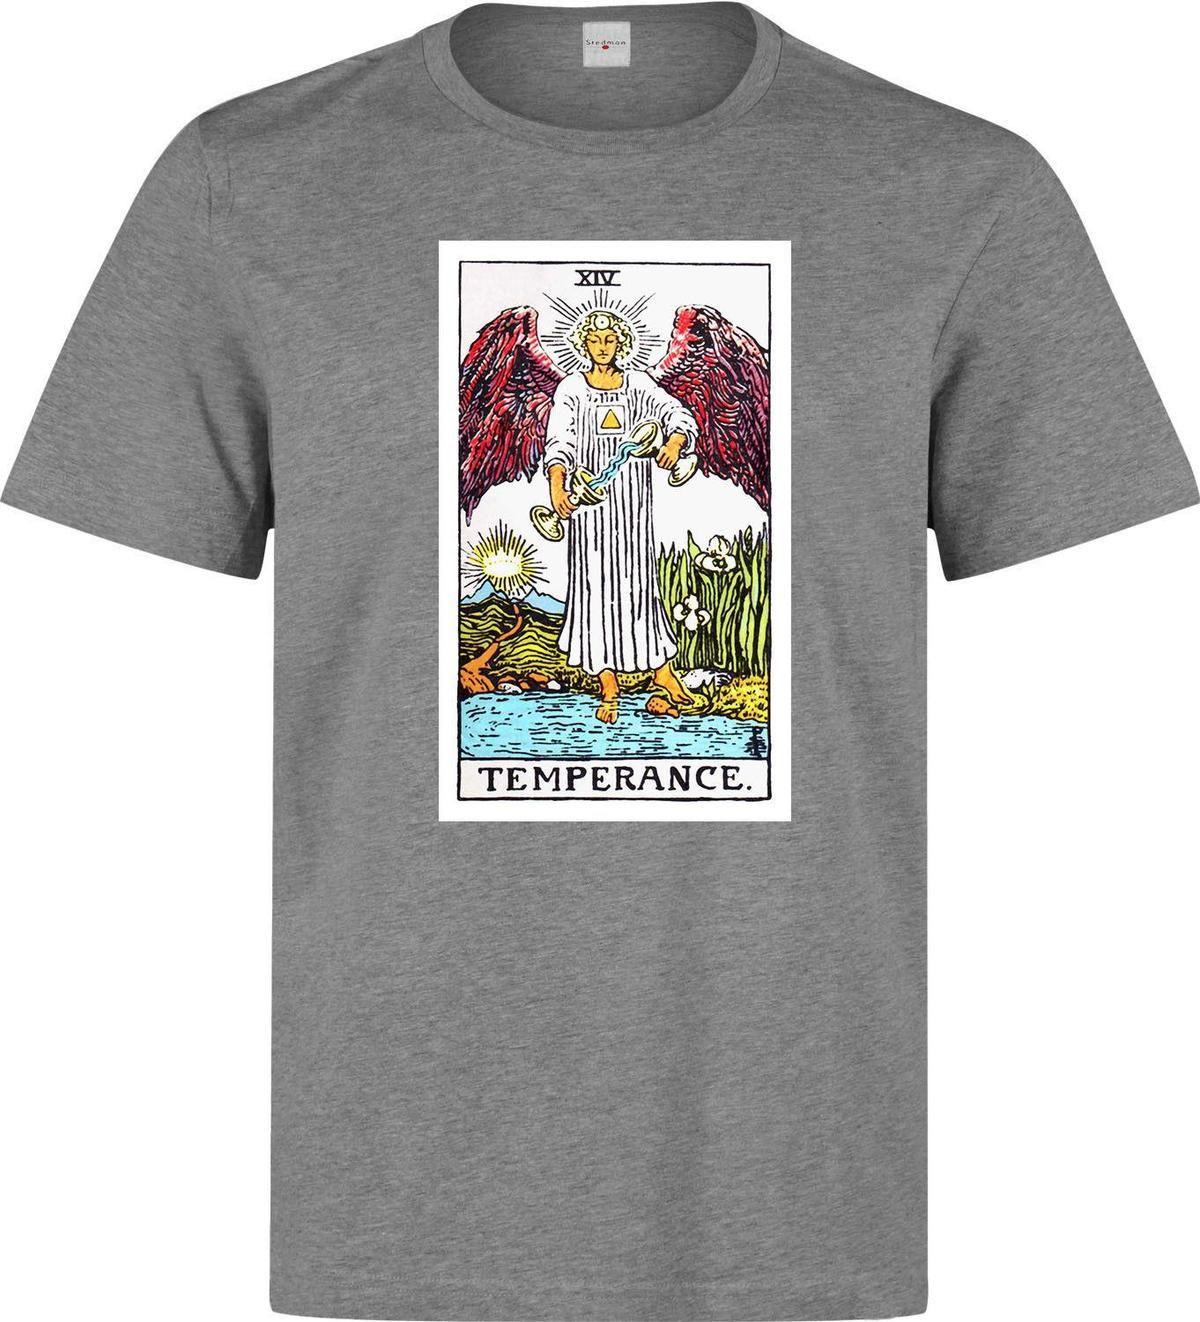 Temperance Tarot Card Art Logo Men s (woman s available) grey t shirt